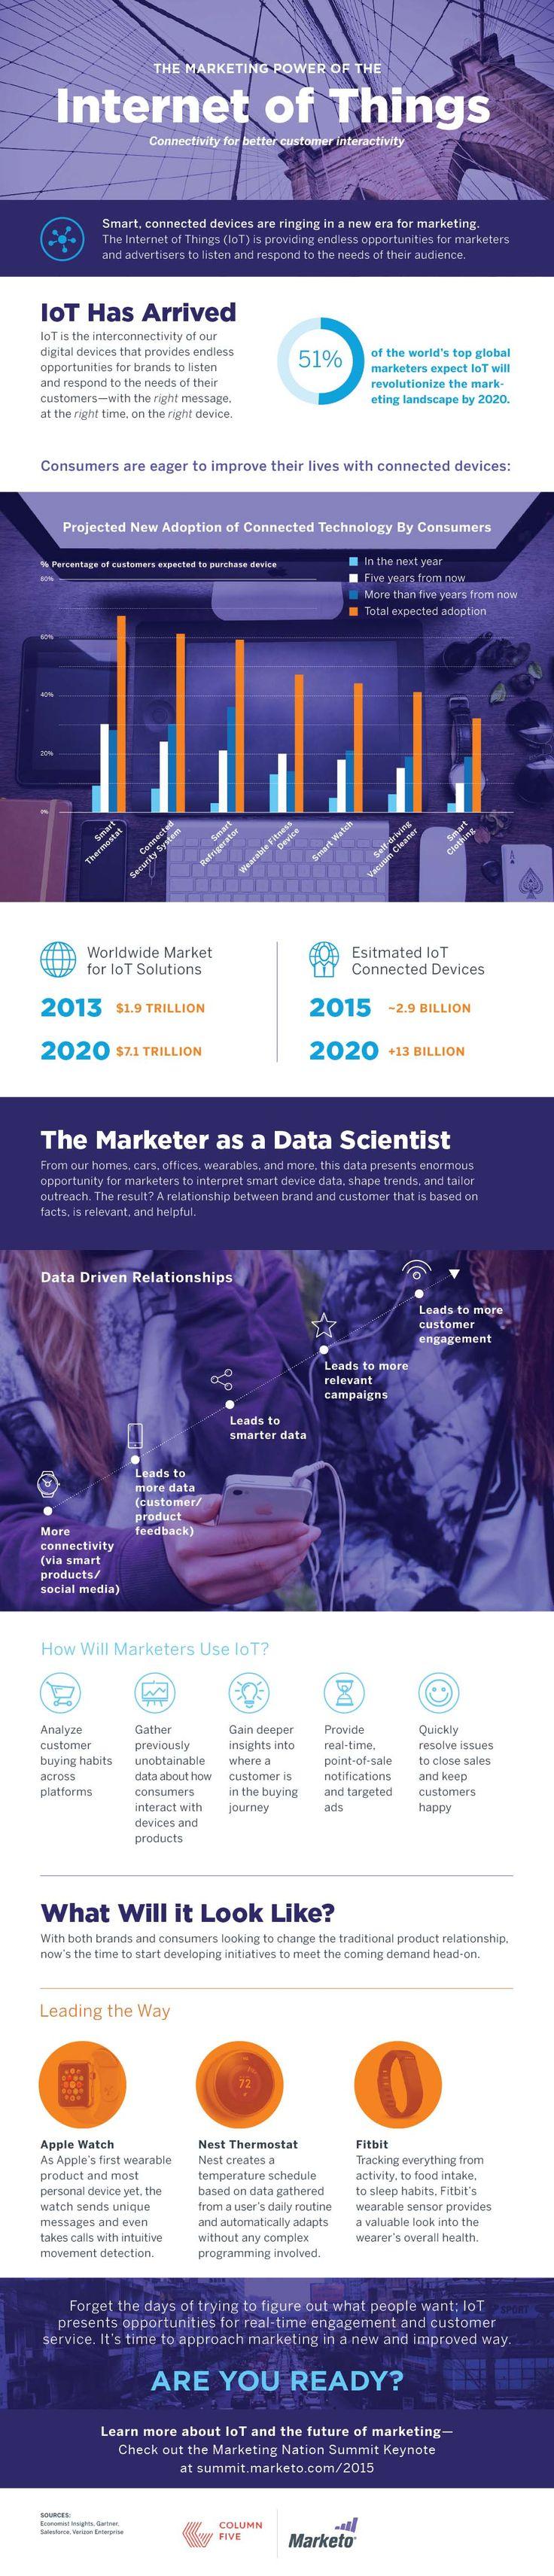 De marketing kracht van het internet  Source: http://blog.marketo.com/2015/04/infographic-the-marketing-power-of-the-internet-of-things-connectivity-for-better-customer-interactivity.html